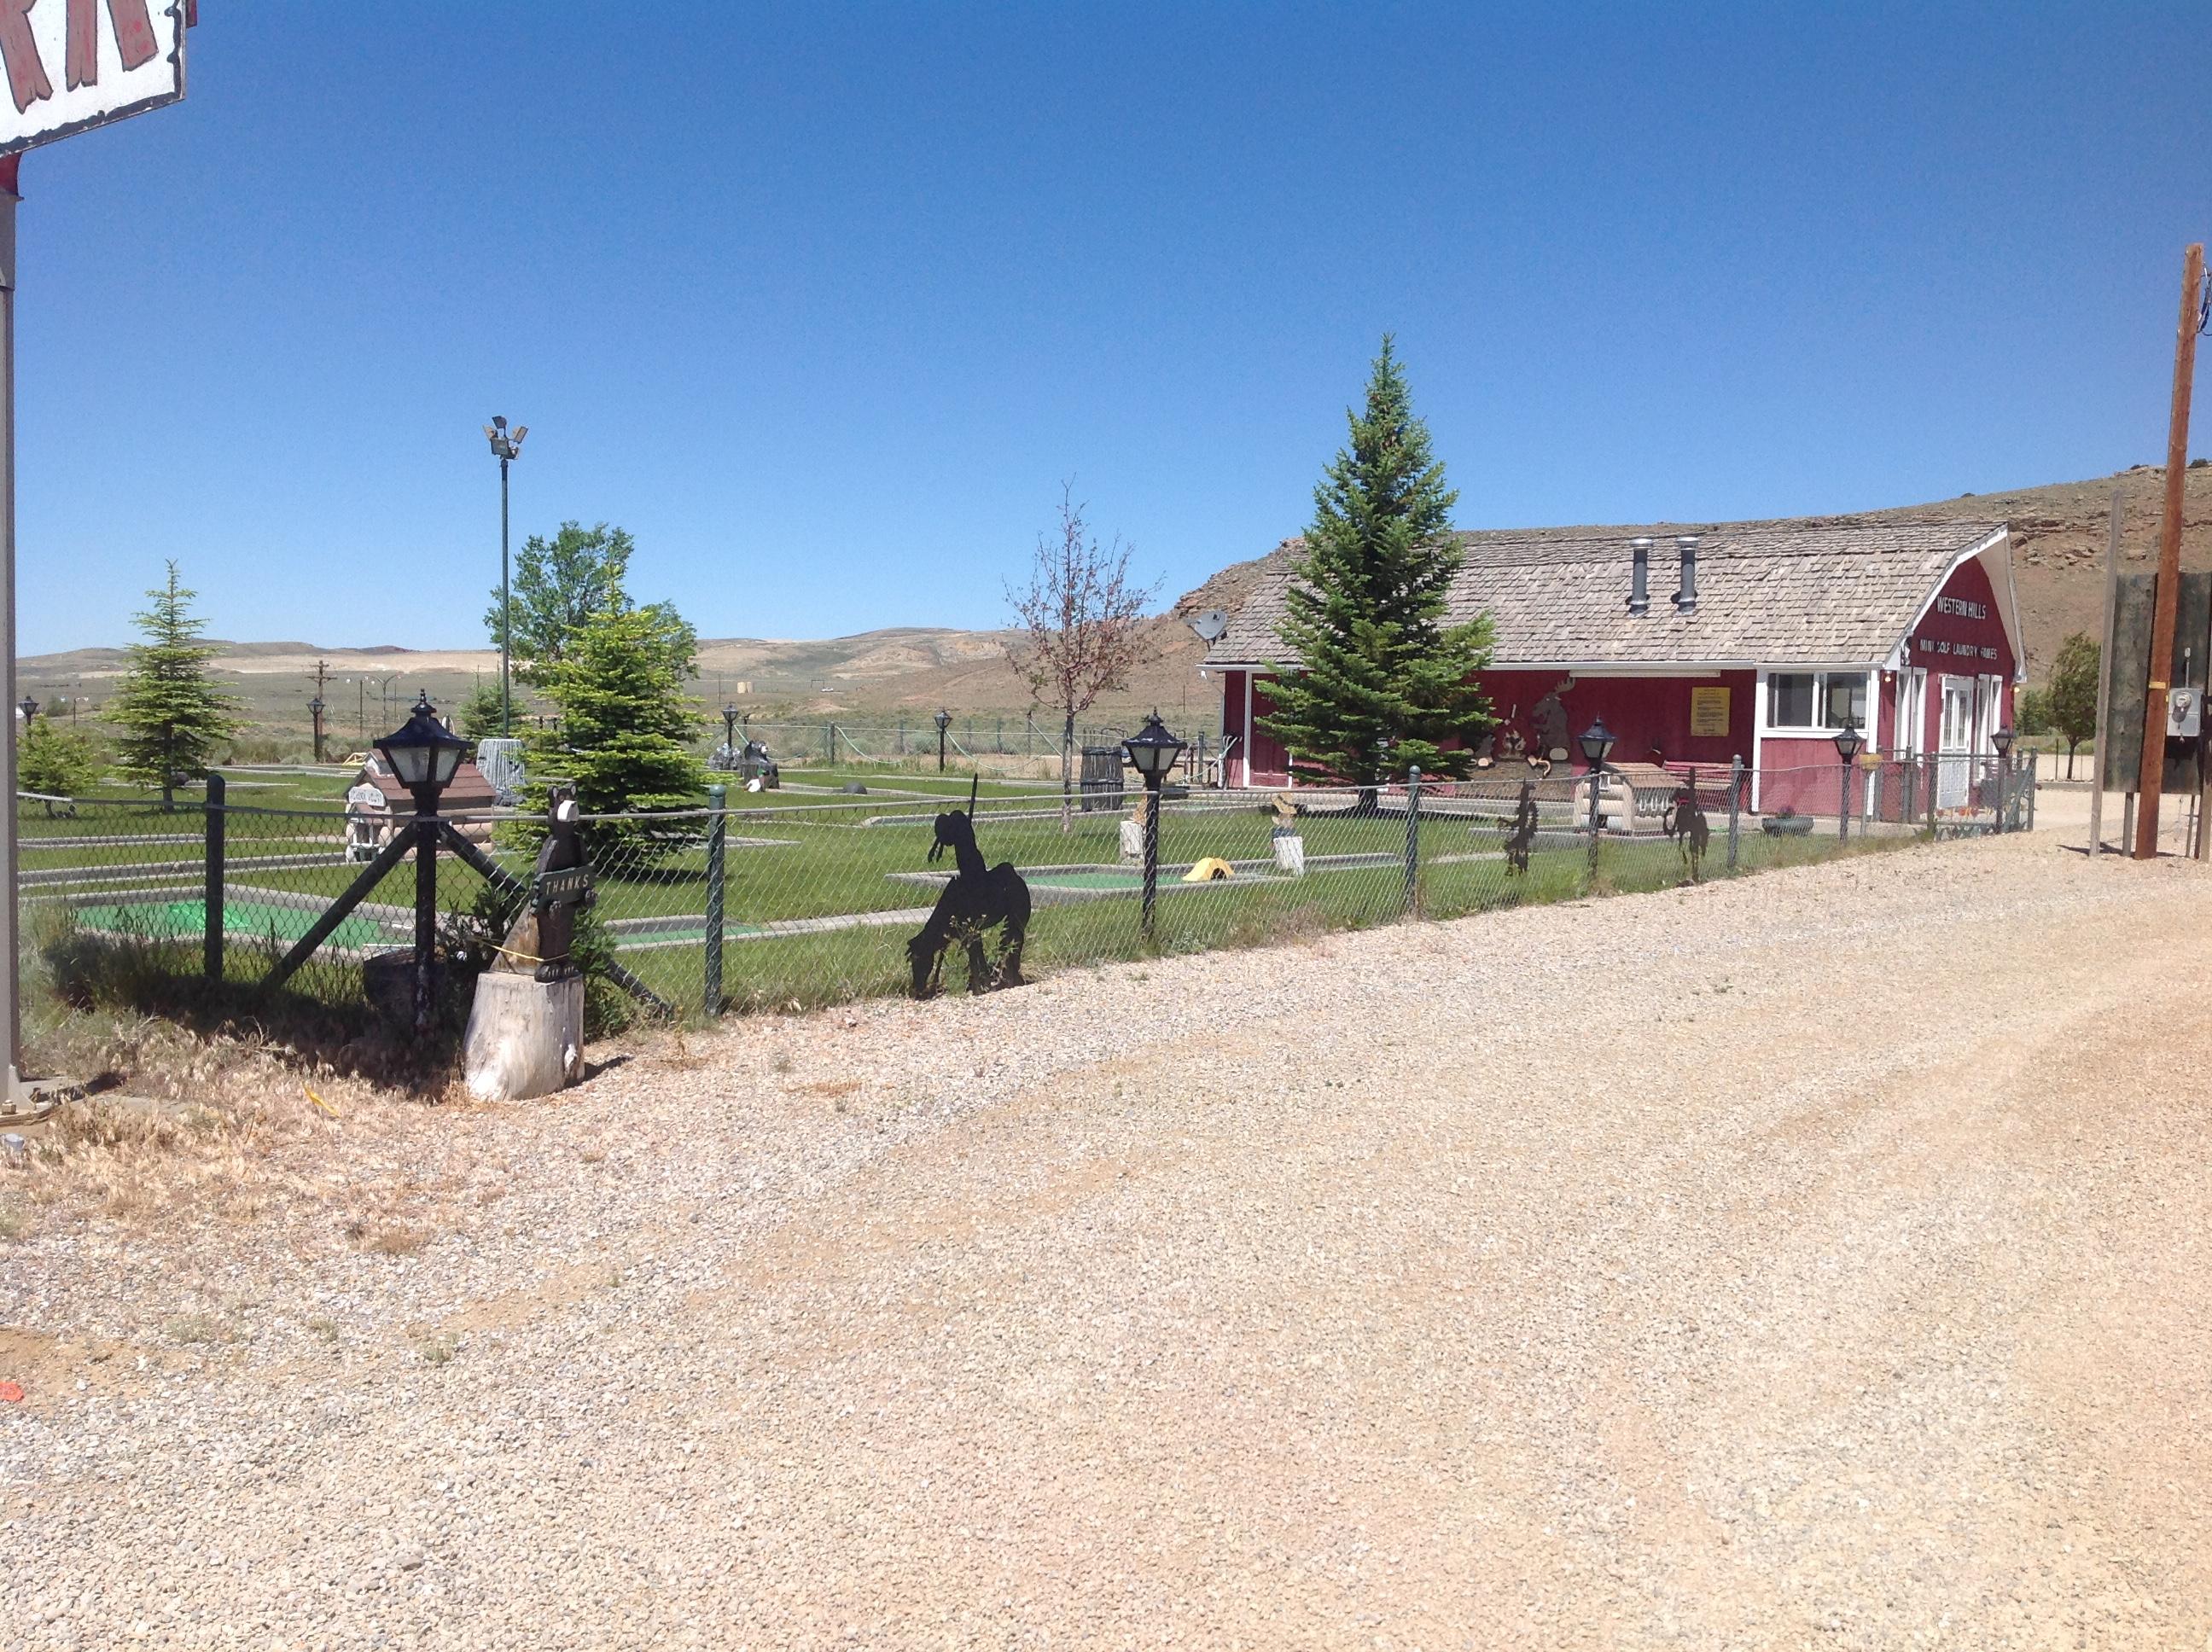 Western Hills Campground,. Rawlins